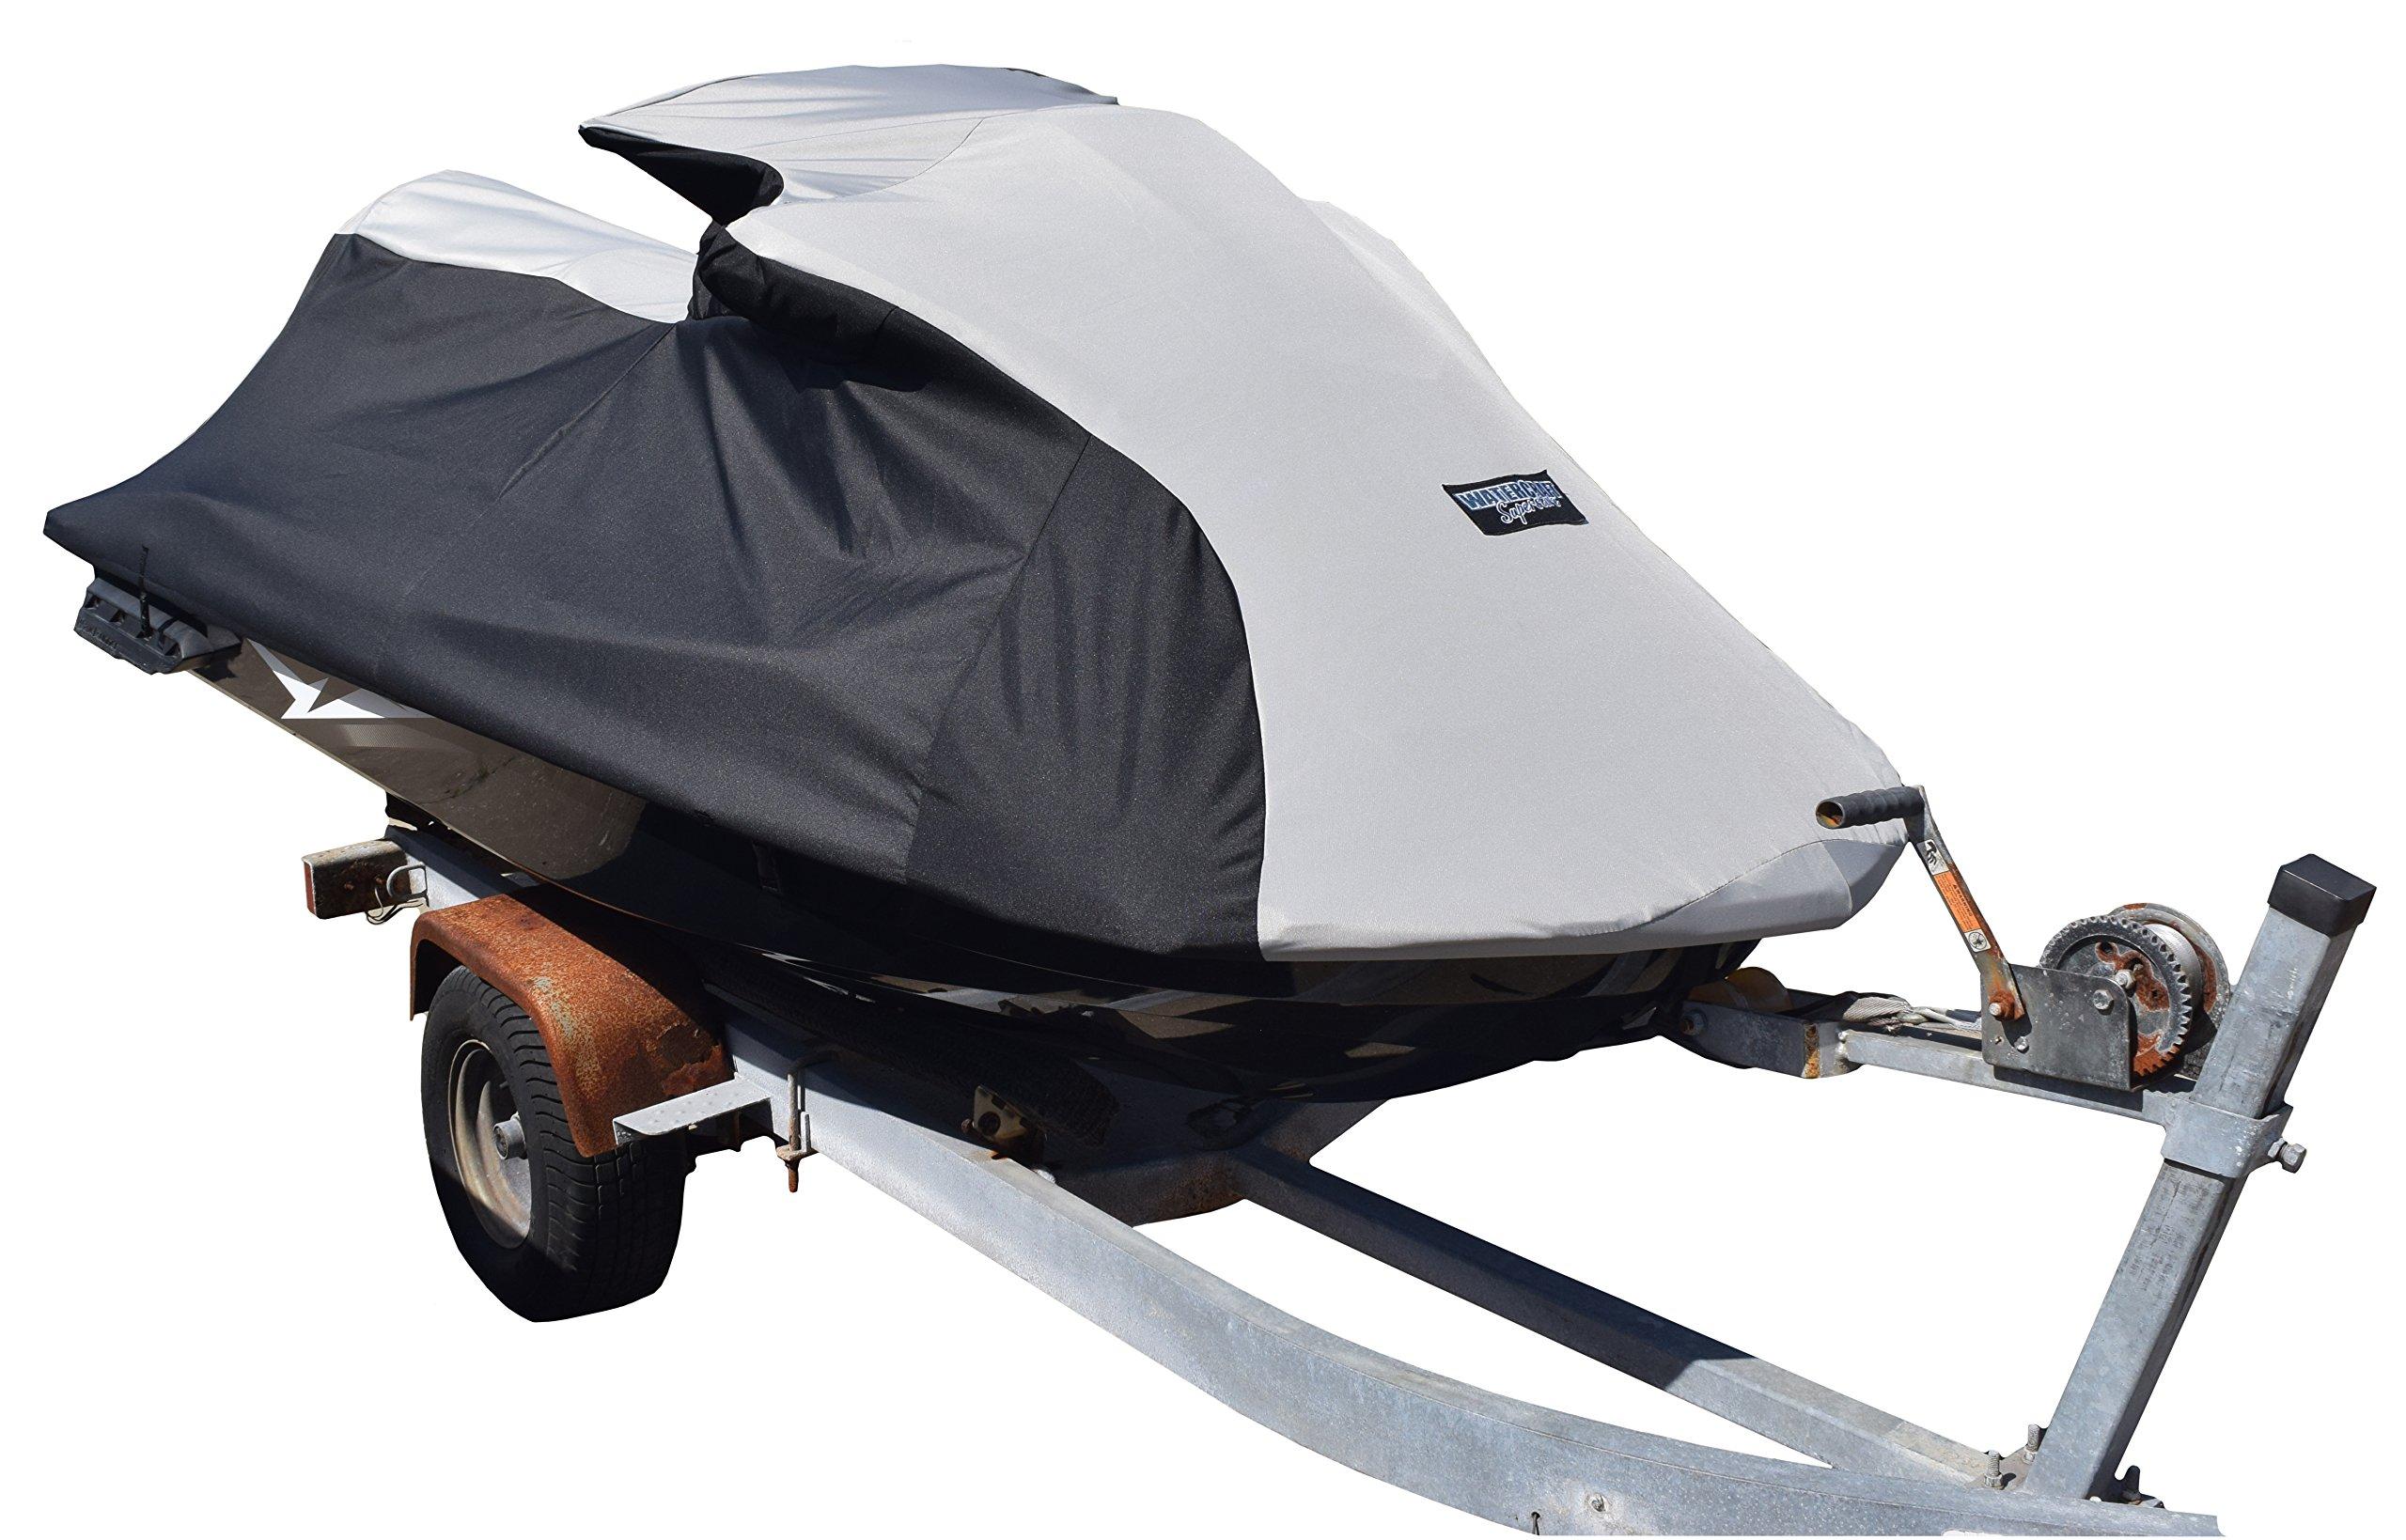 Yamaha 2012-2018 FX HO, SHO, SVHO / 2012-2018 FX Cruiser (all) / FX Limited SVHO Storage Cover